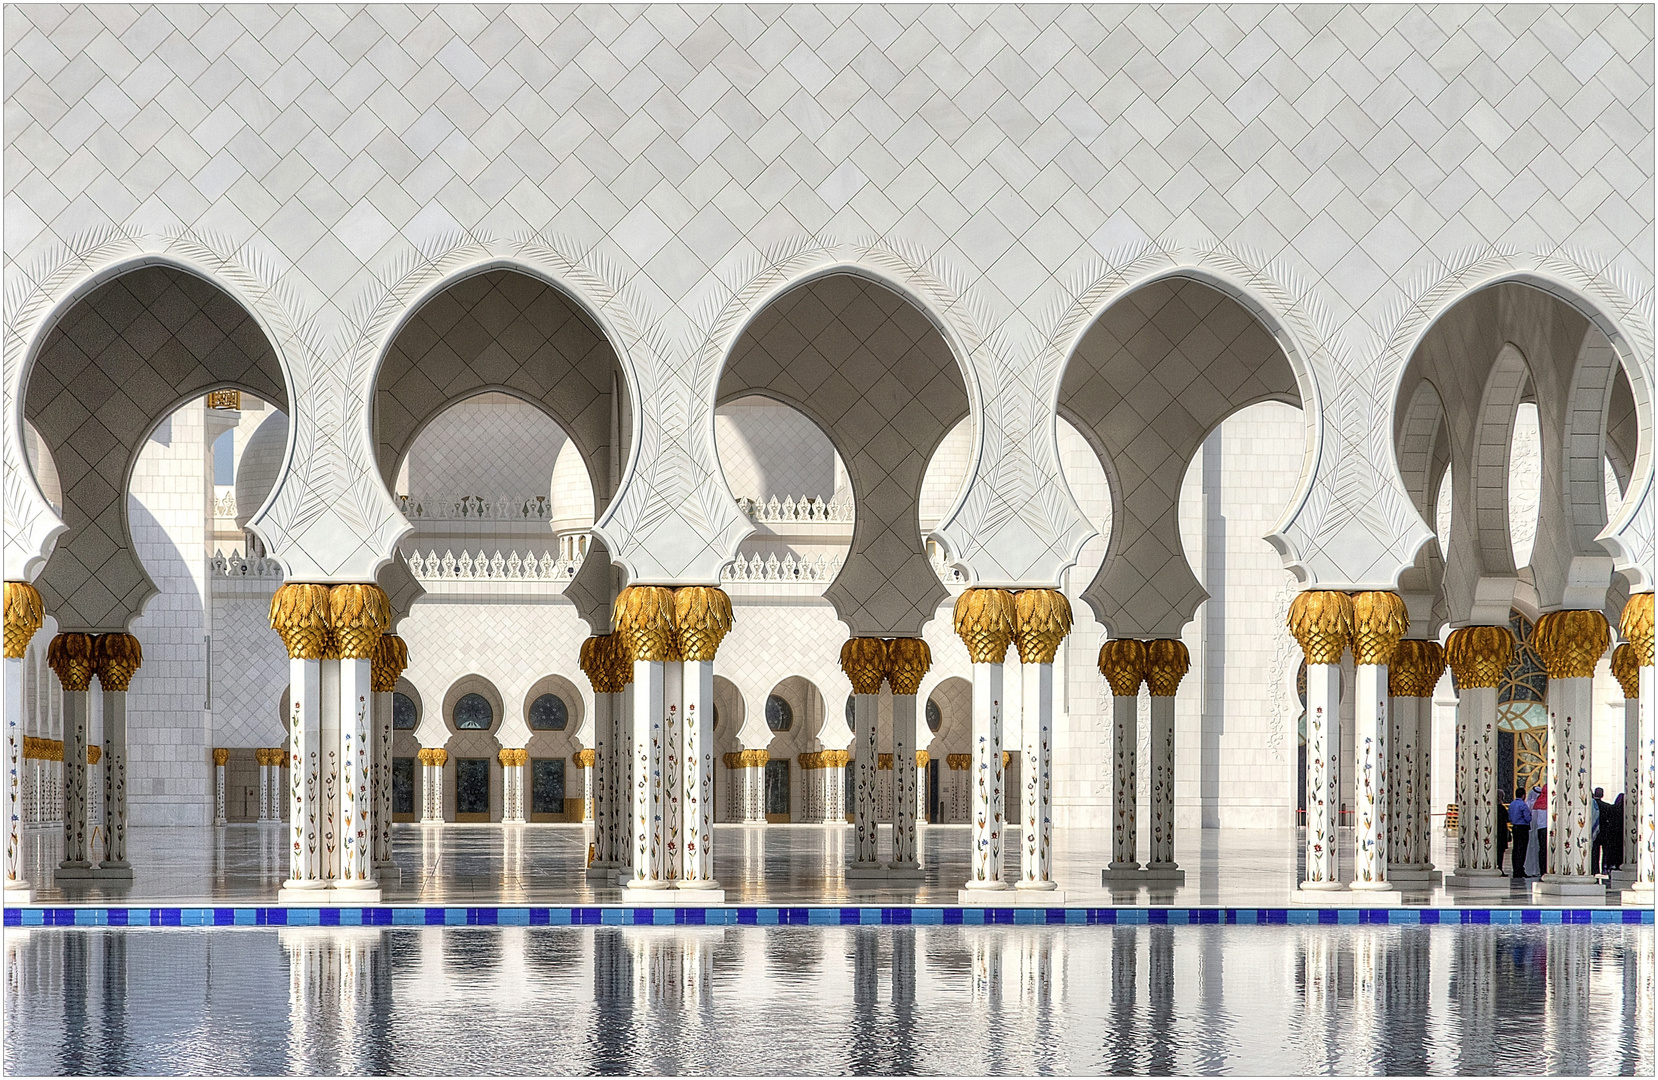 Architektur des Orients